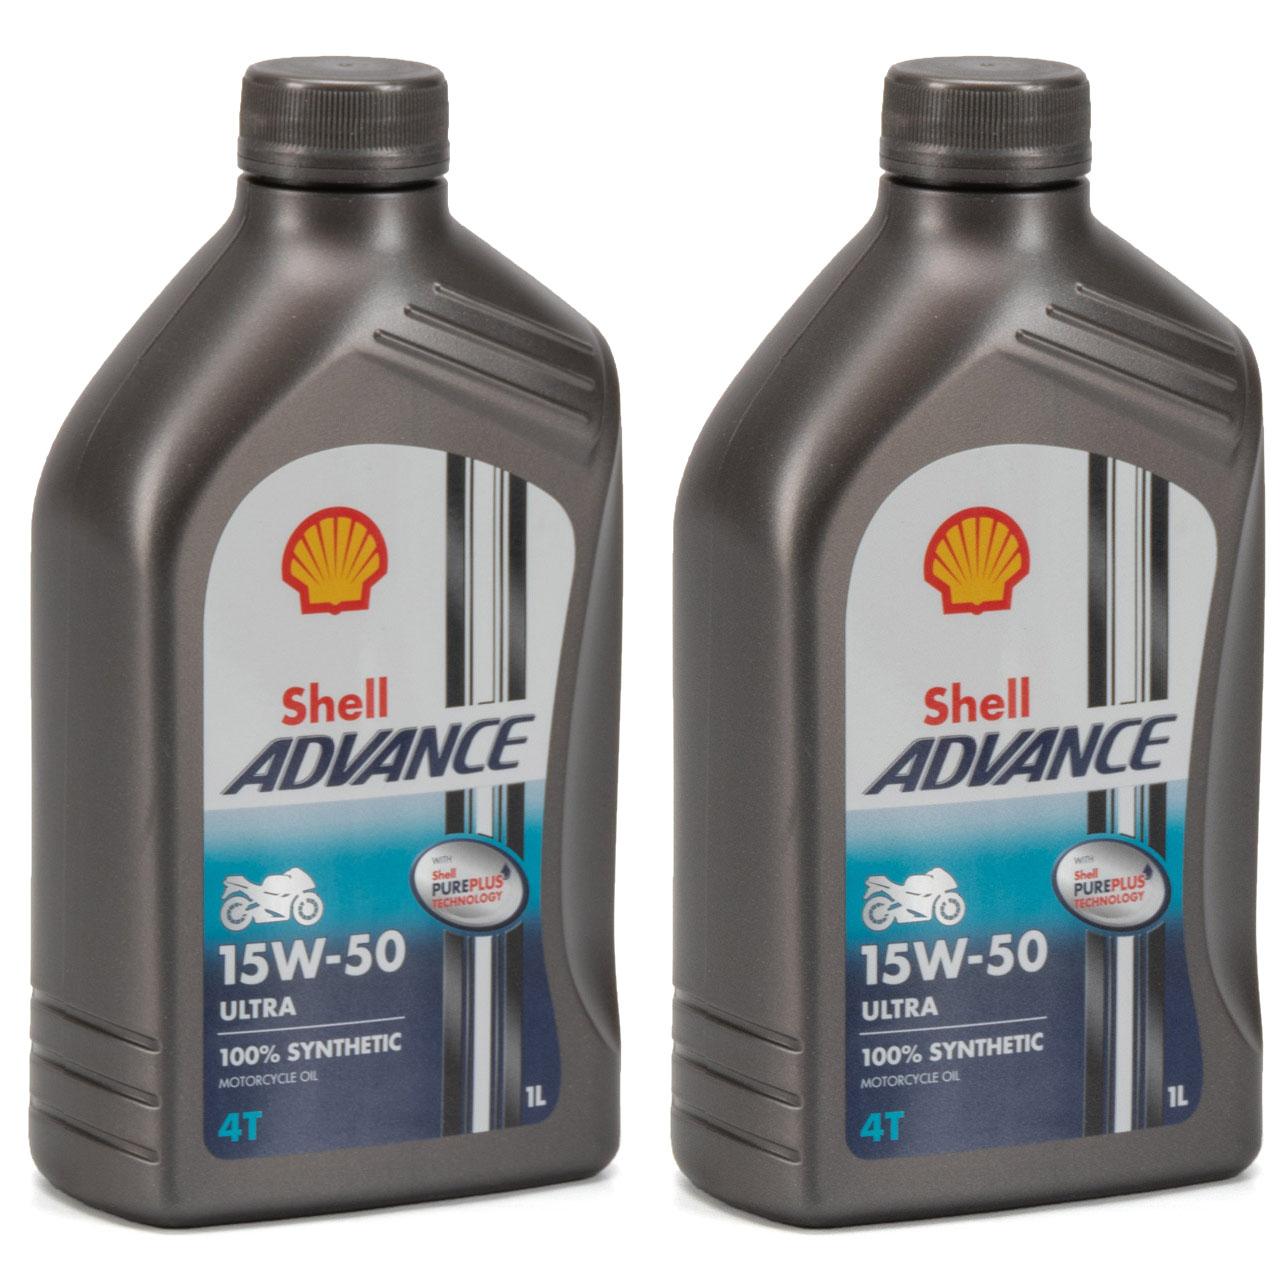 SHELL Motoröl Öl ADVANCE ULTRA 4T 4-TAKT 15W-50 API SN JASO MA-2 - 2L 2 Liter